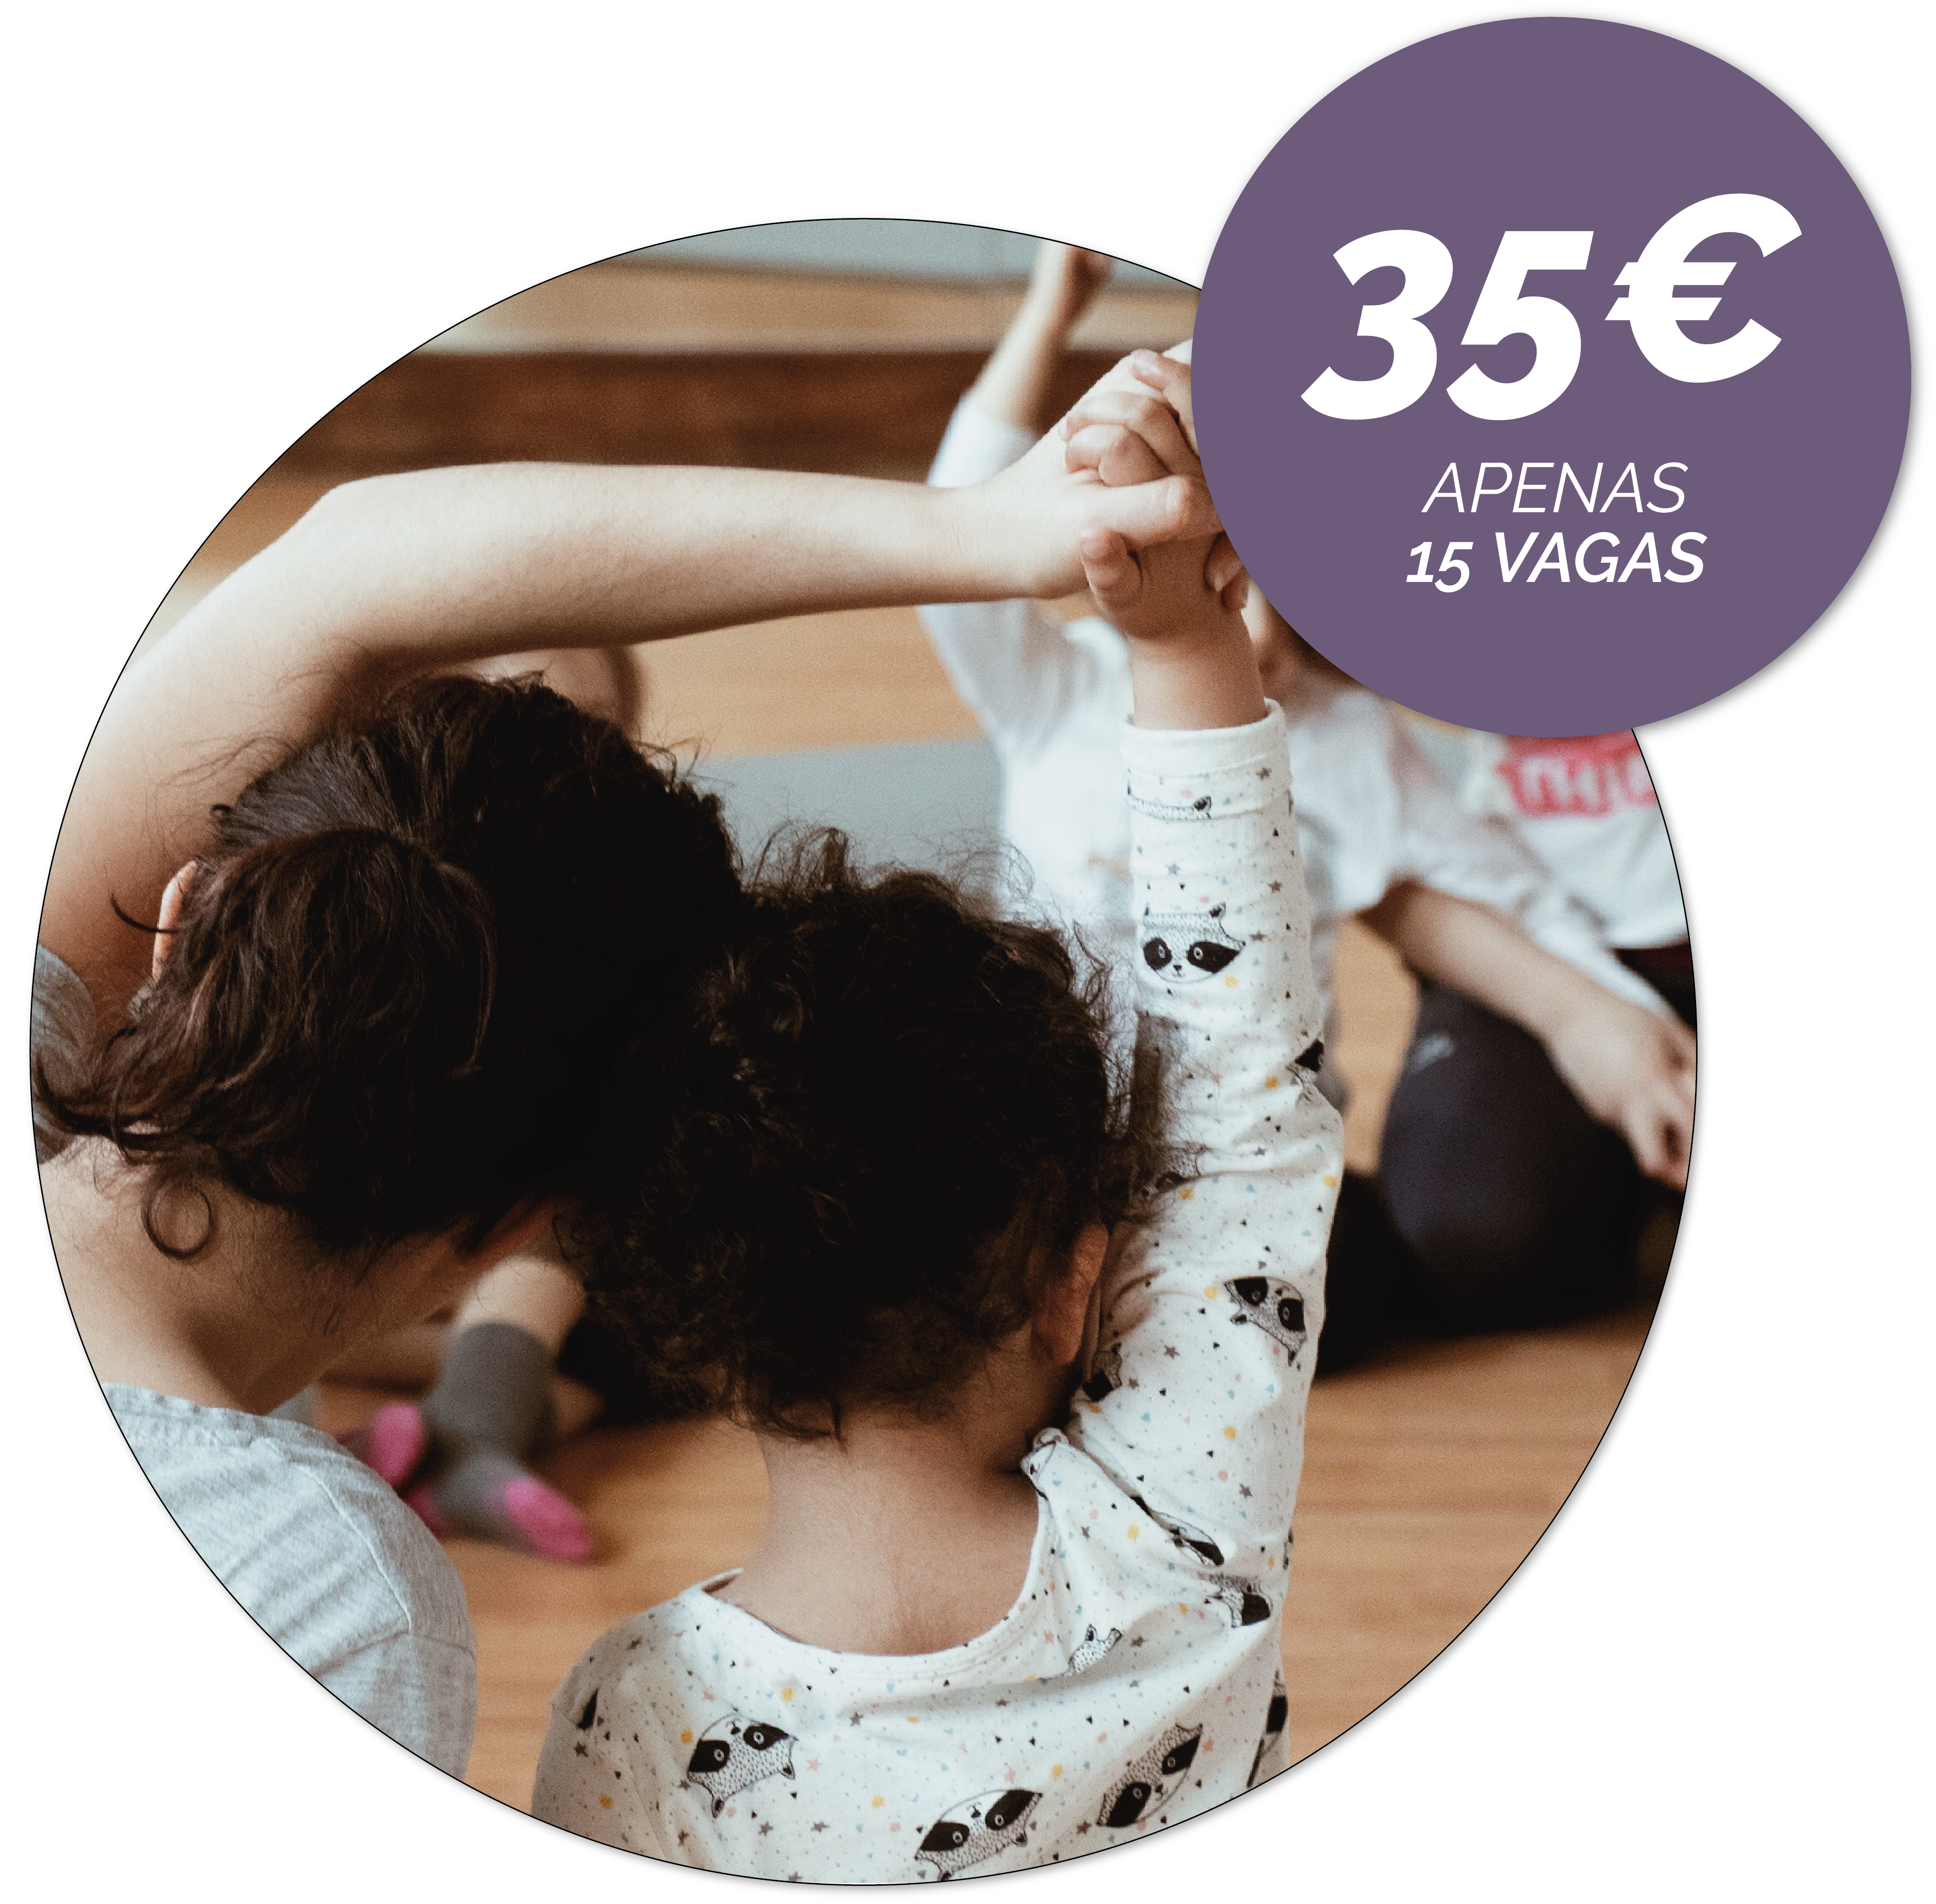 YK img - Cursos intensivos: Baby Yoga & Yoga Kids